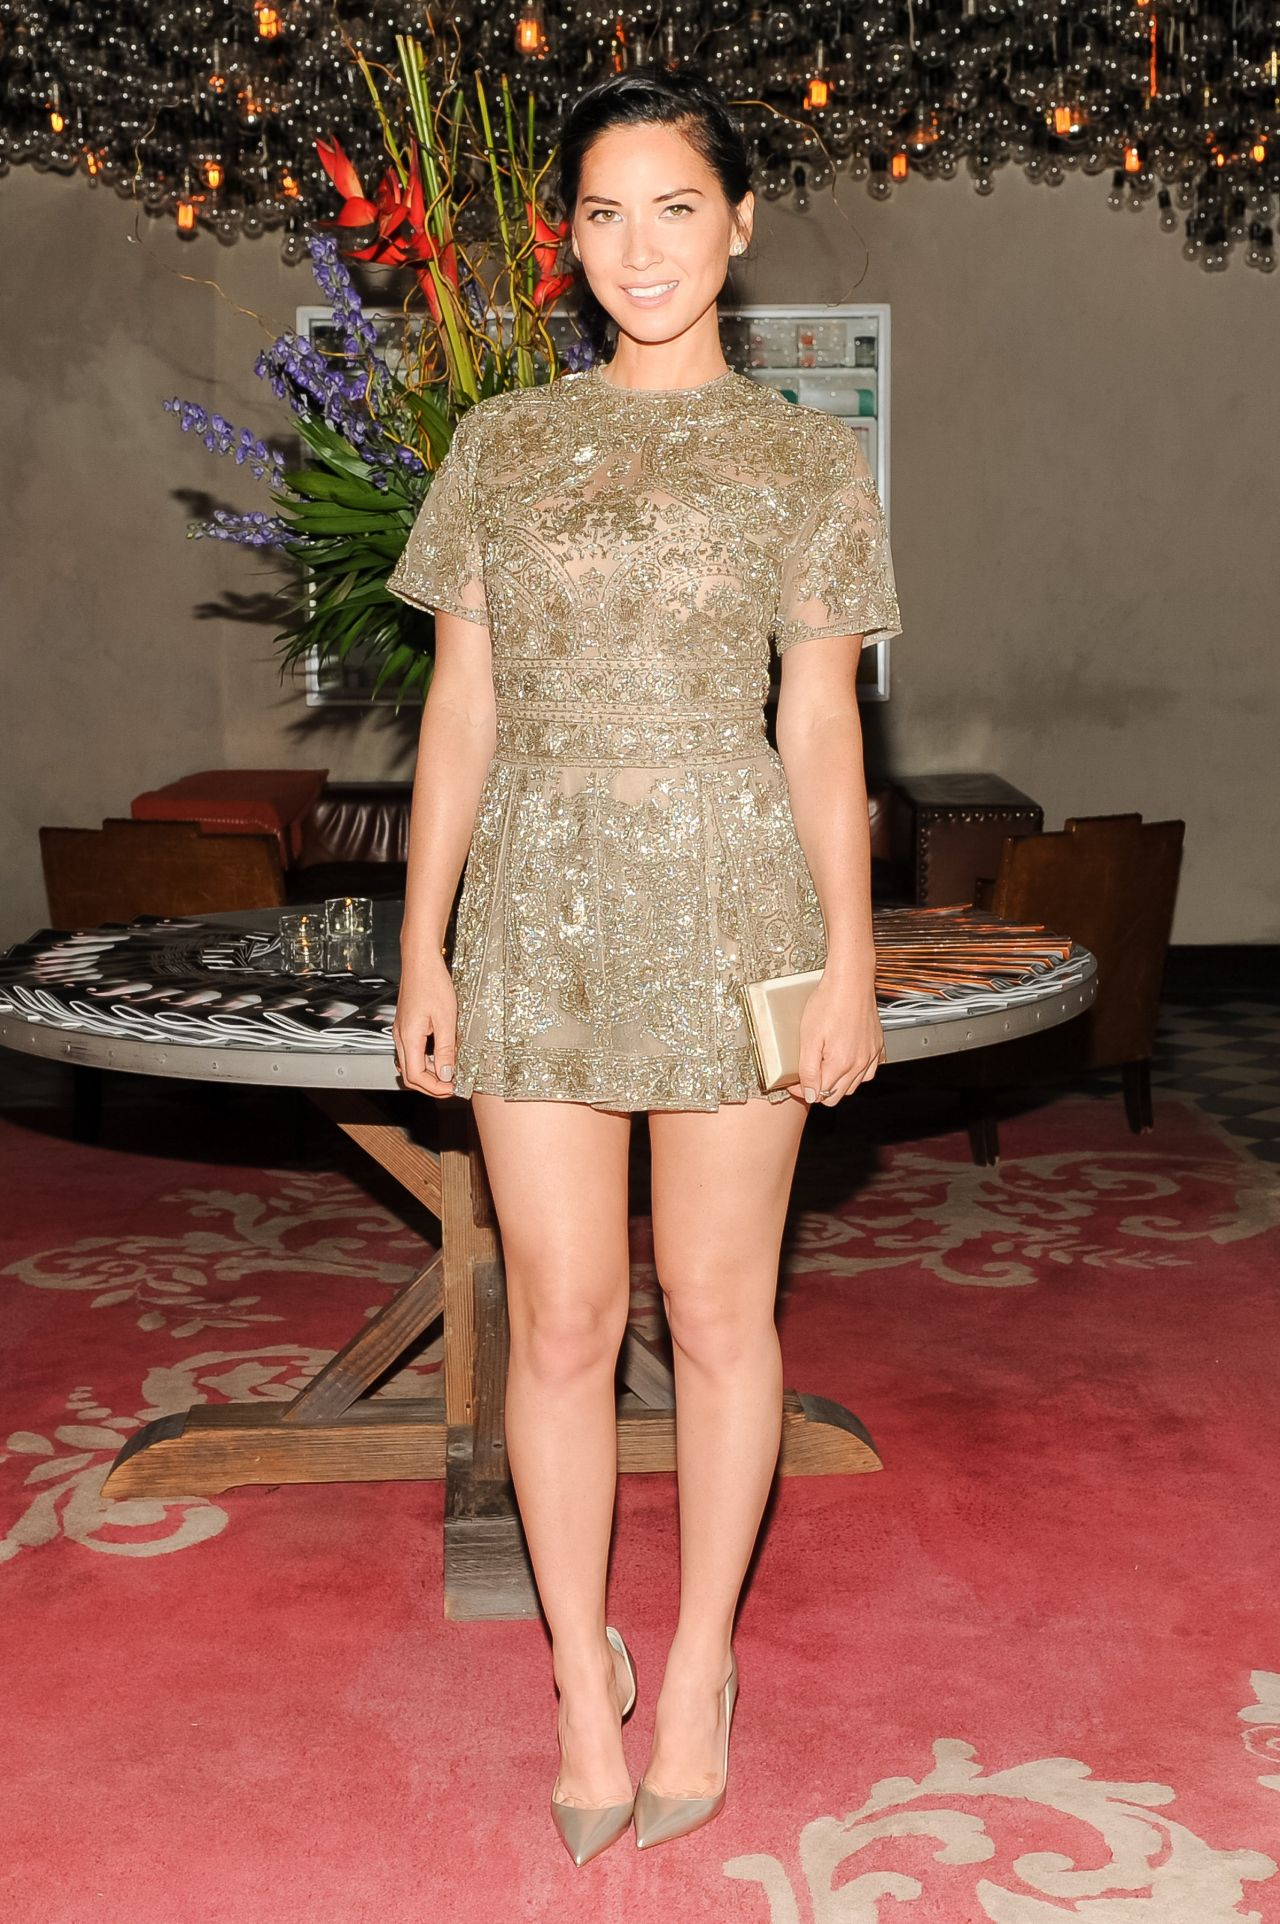 Olivia Munn - THR & Micaela Erlanger Celebrates Fashion Week in New York City